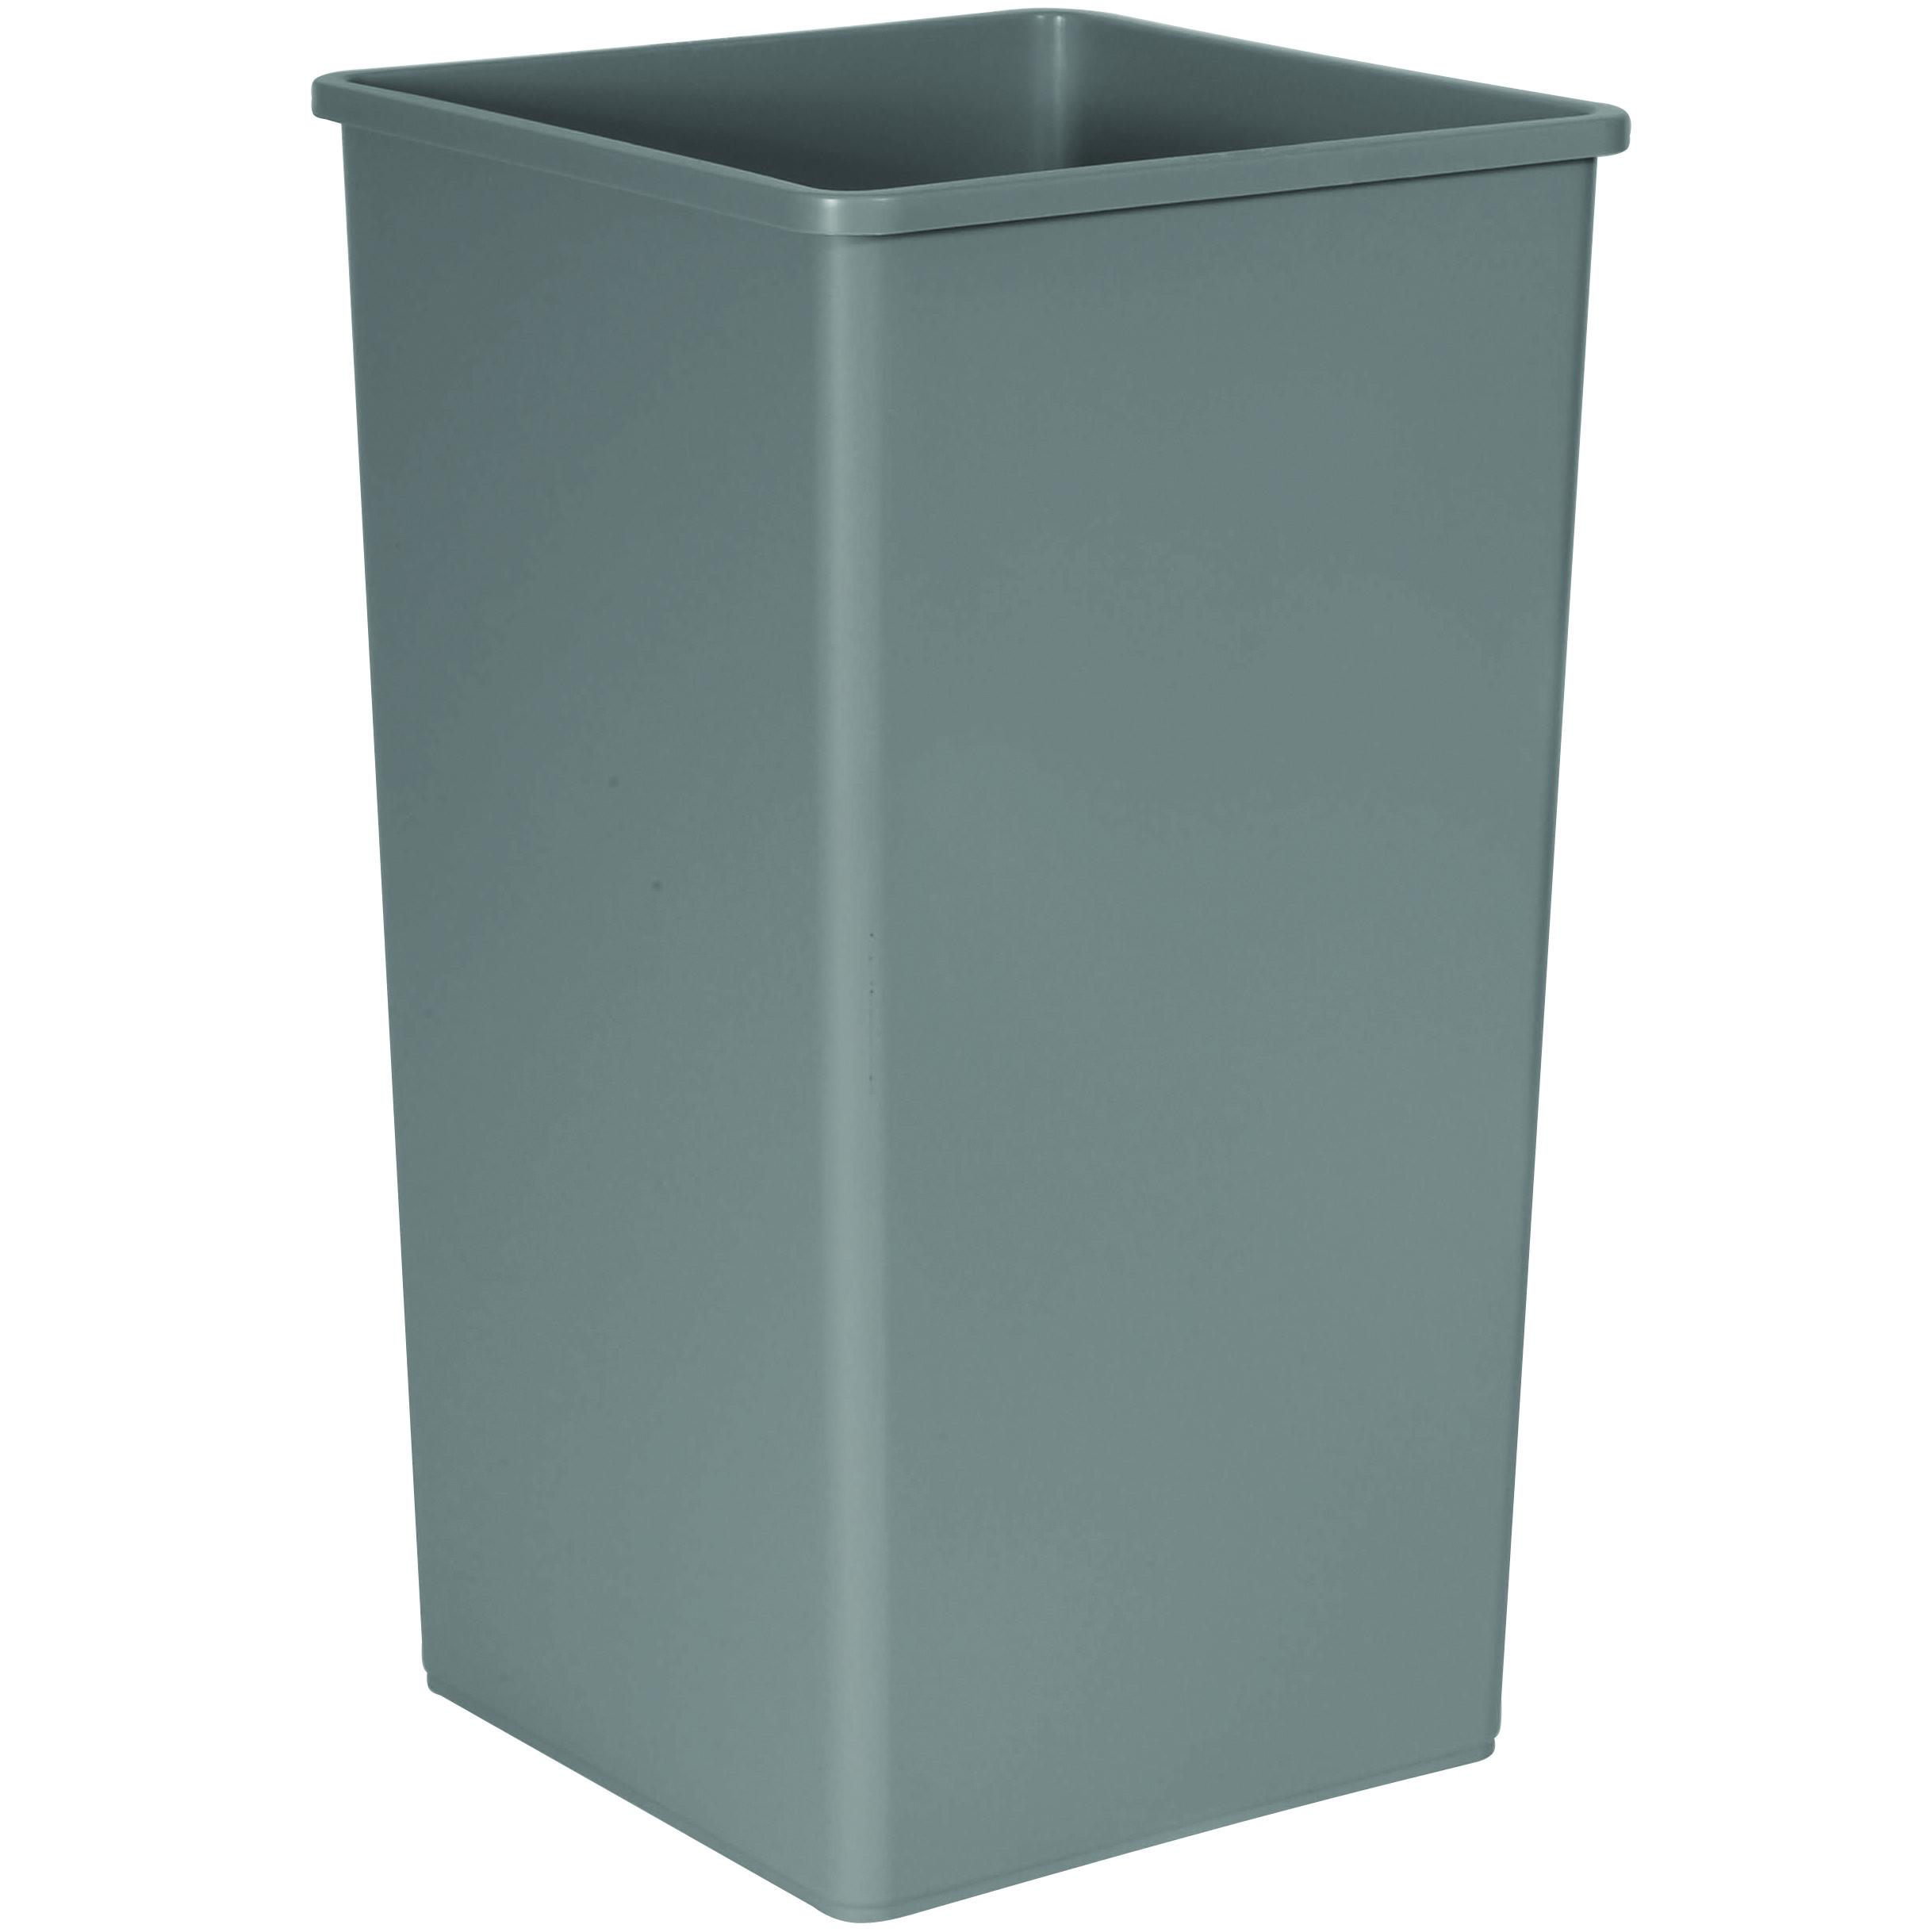 50 Gallon Untouchable Square Trash Container Trashcans